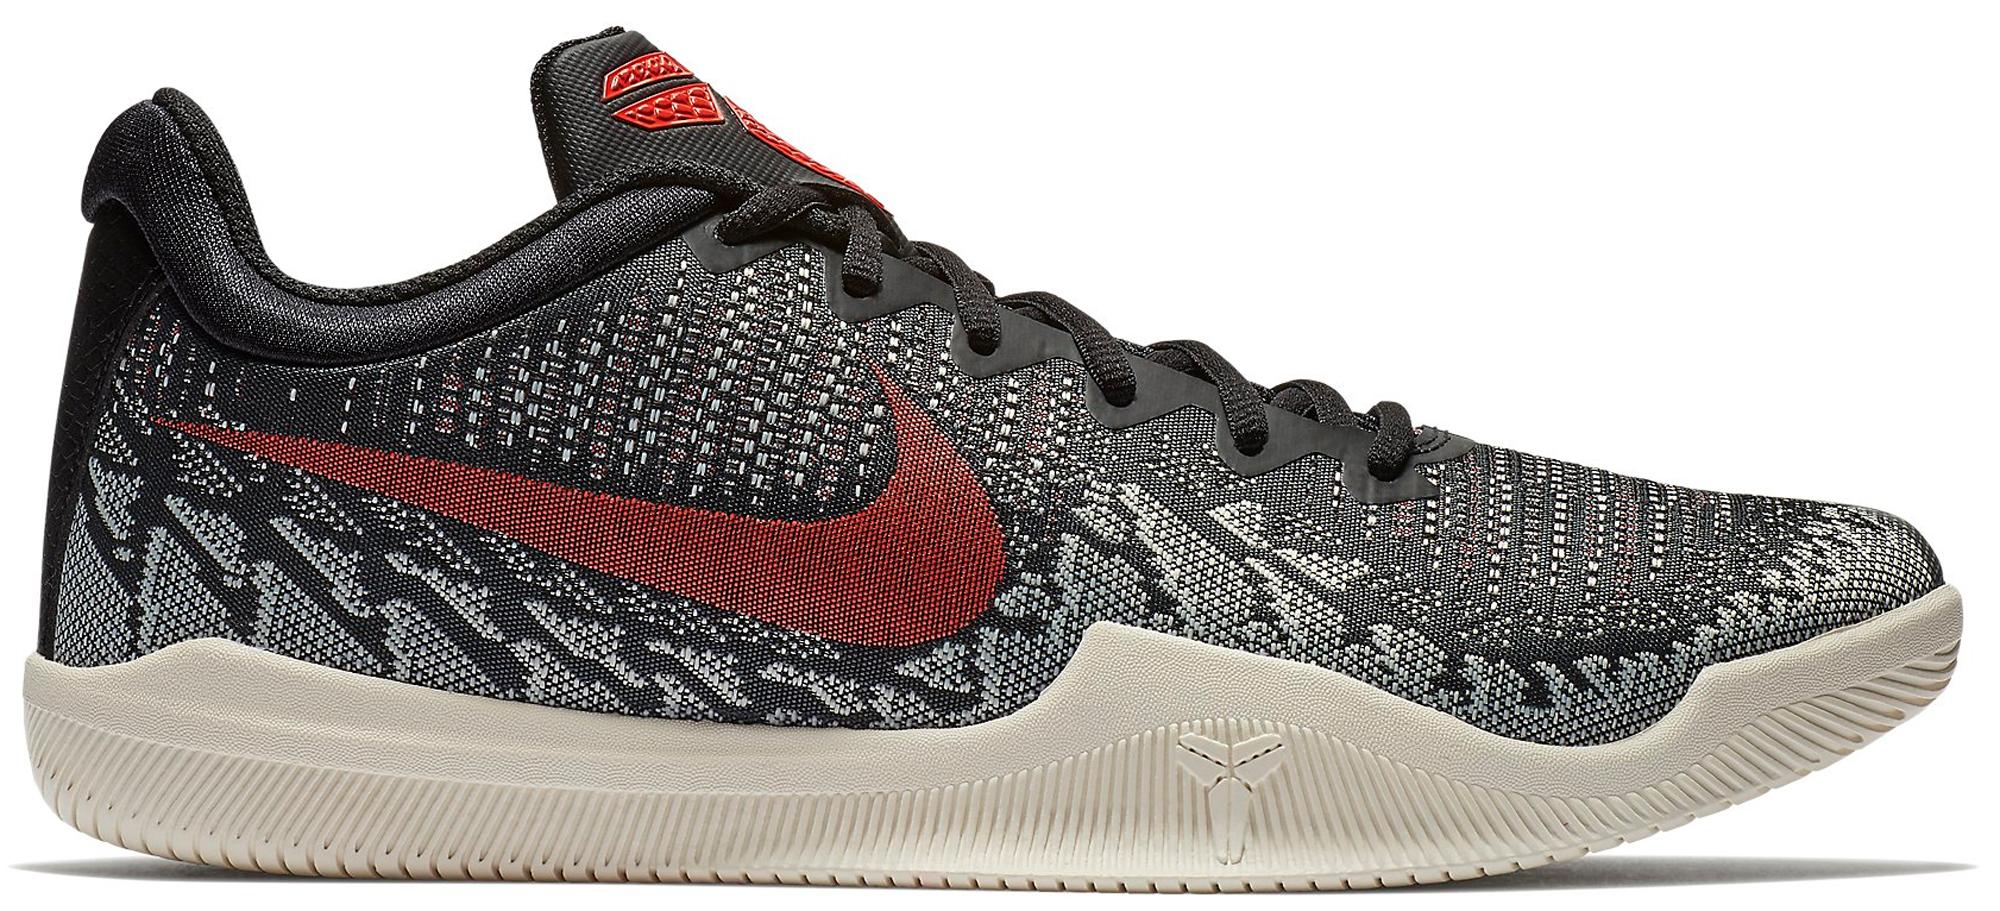 Nike Mamba Rage Black Crimson